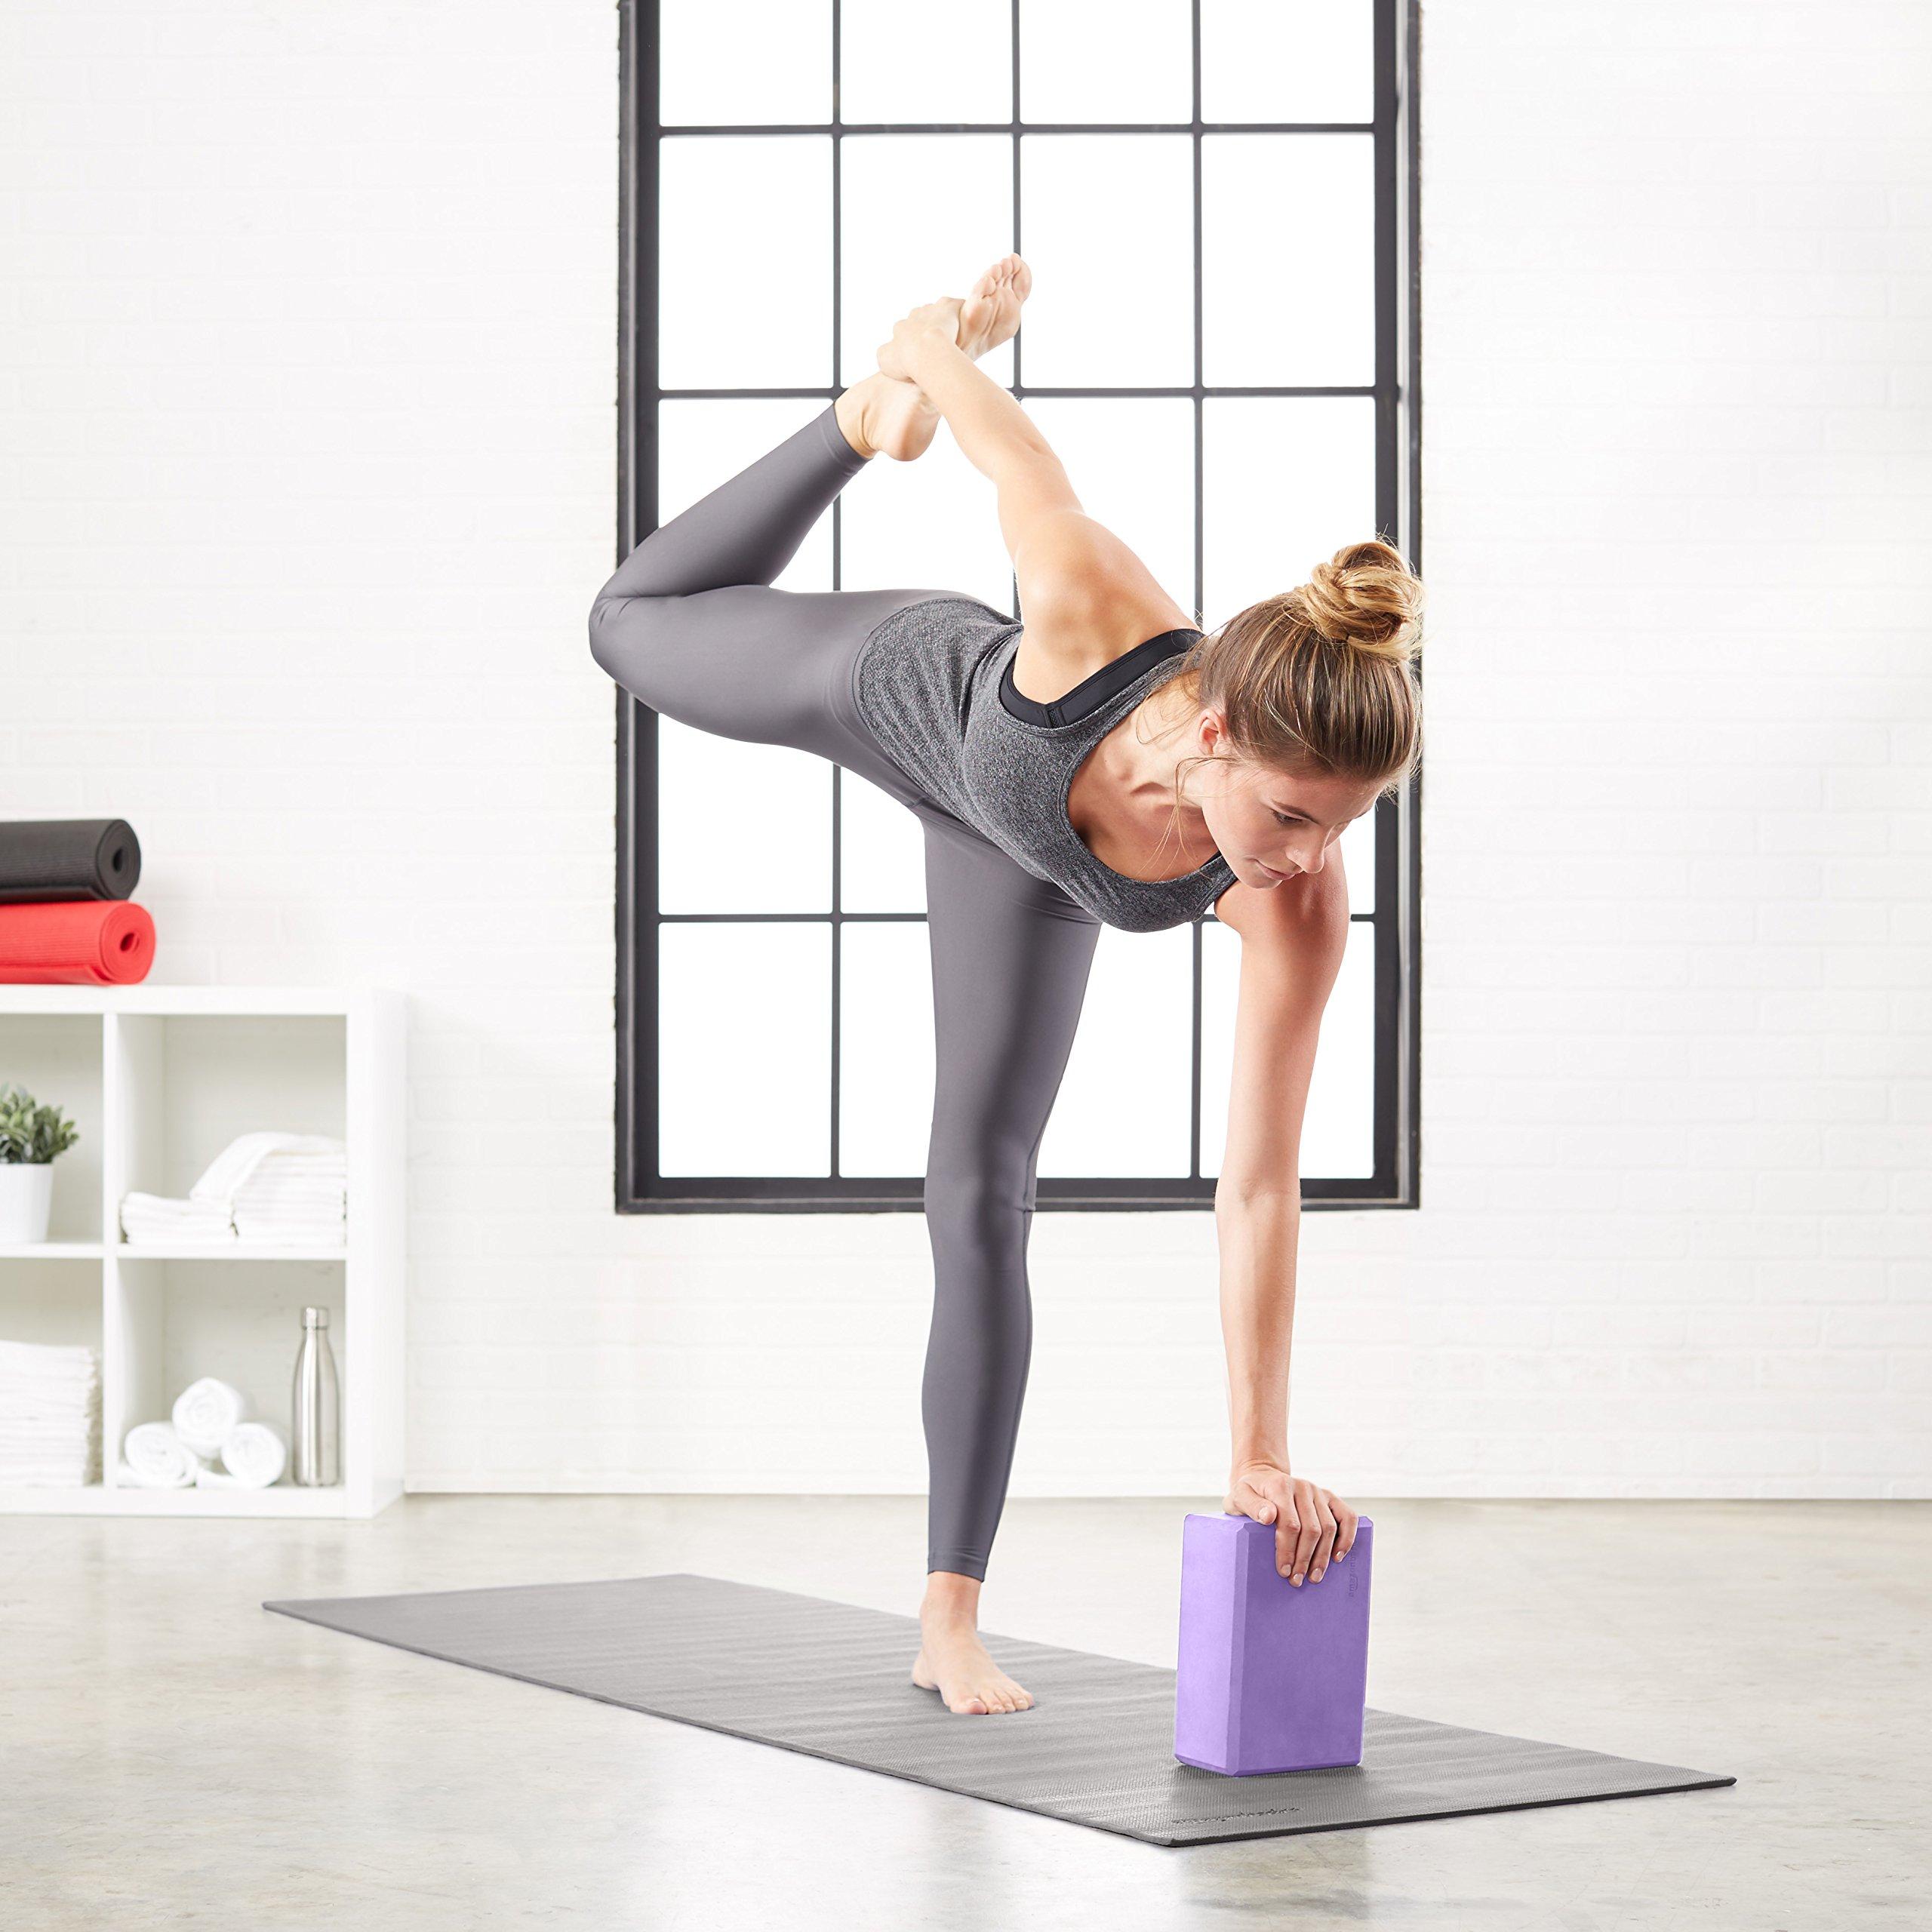 AmazonBasics Foam Yoga Blocks - 4 x 9 x 6 Inches, Set of 2, Purple by AmazonBasics (Image #3)